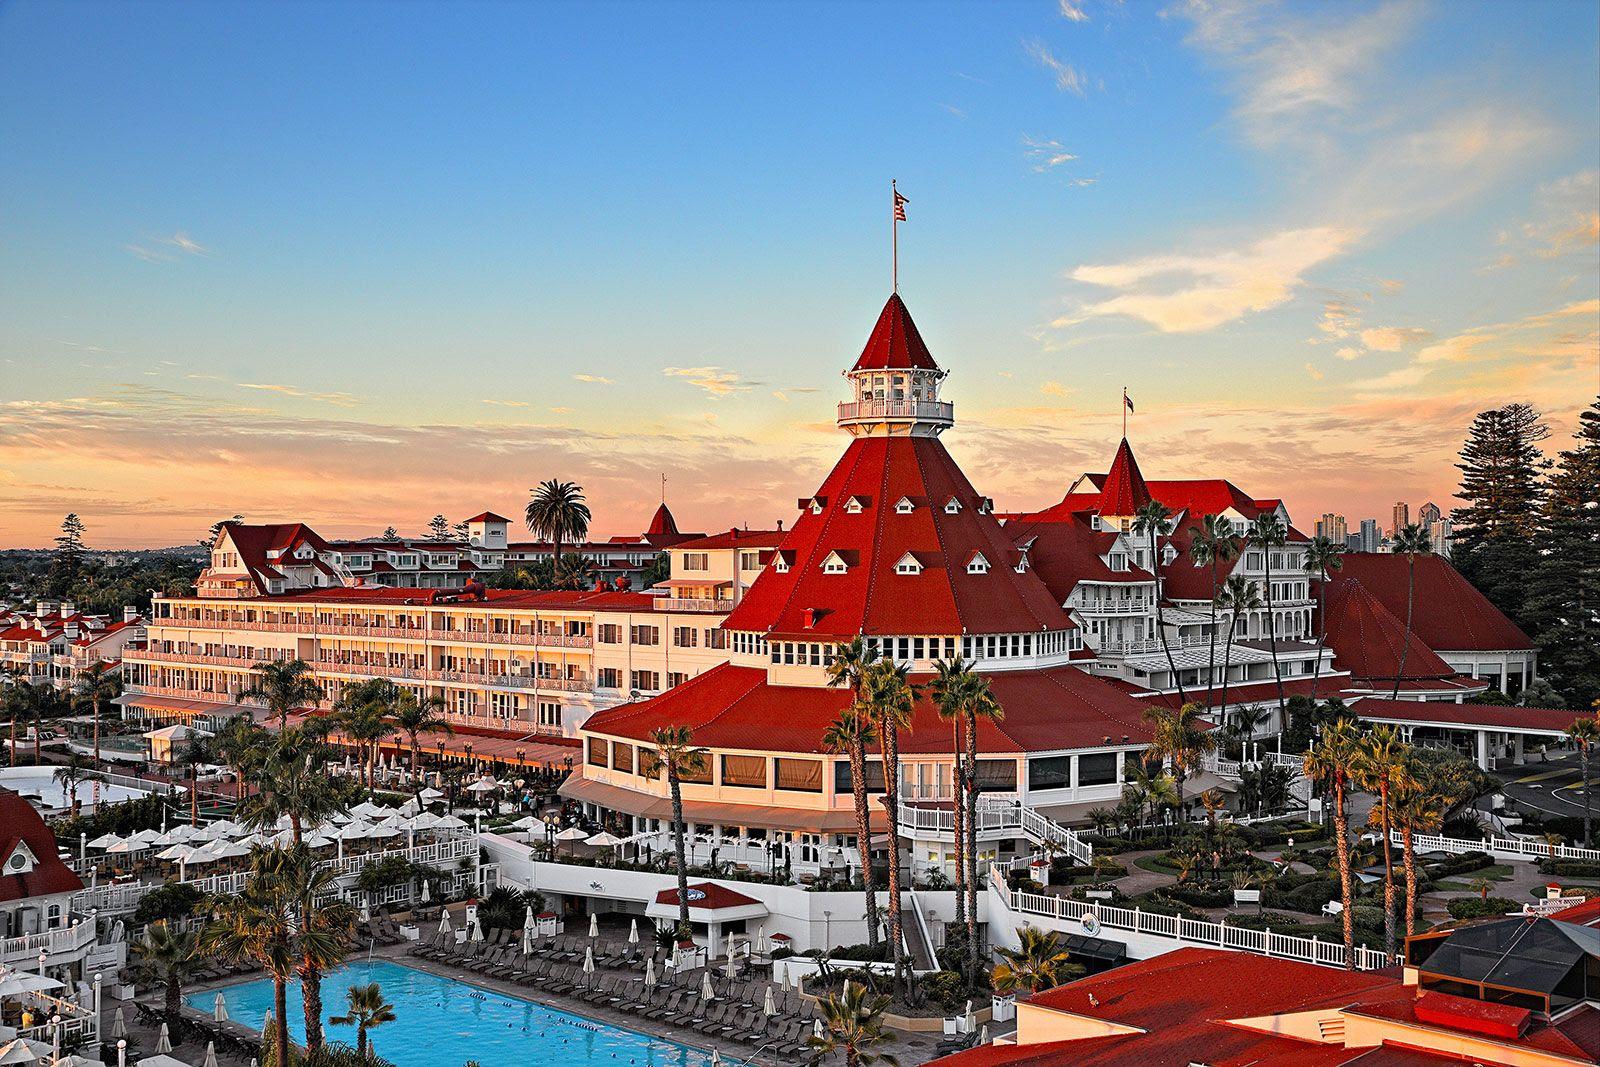 Iconic Hotel del Coronado Sold in MultiBillion Dollar Deal